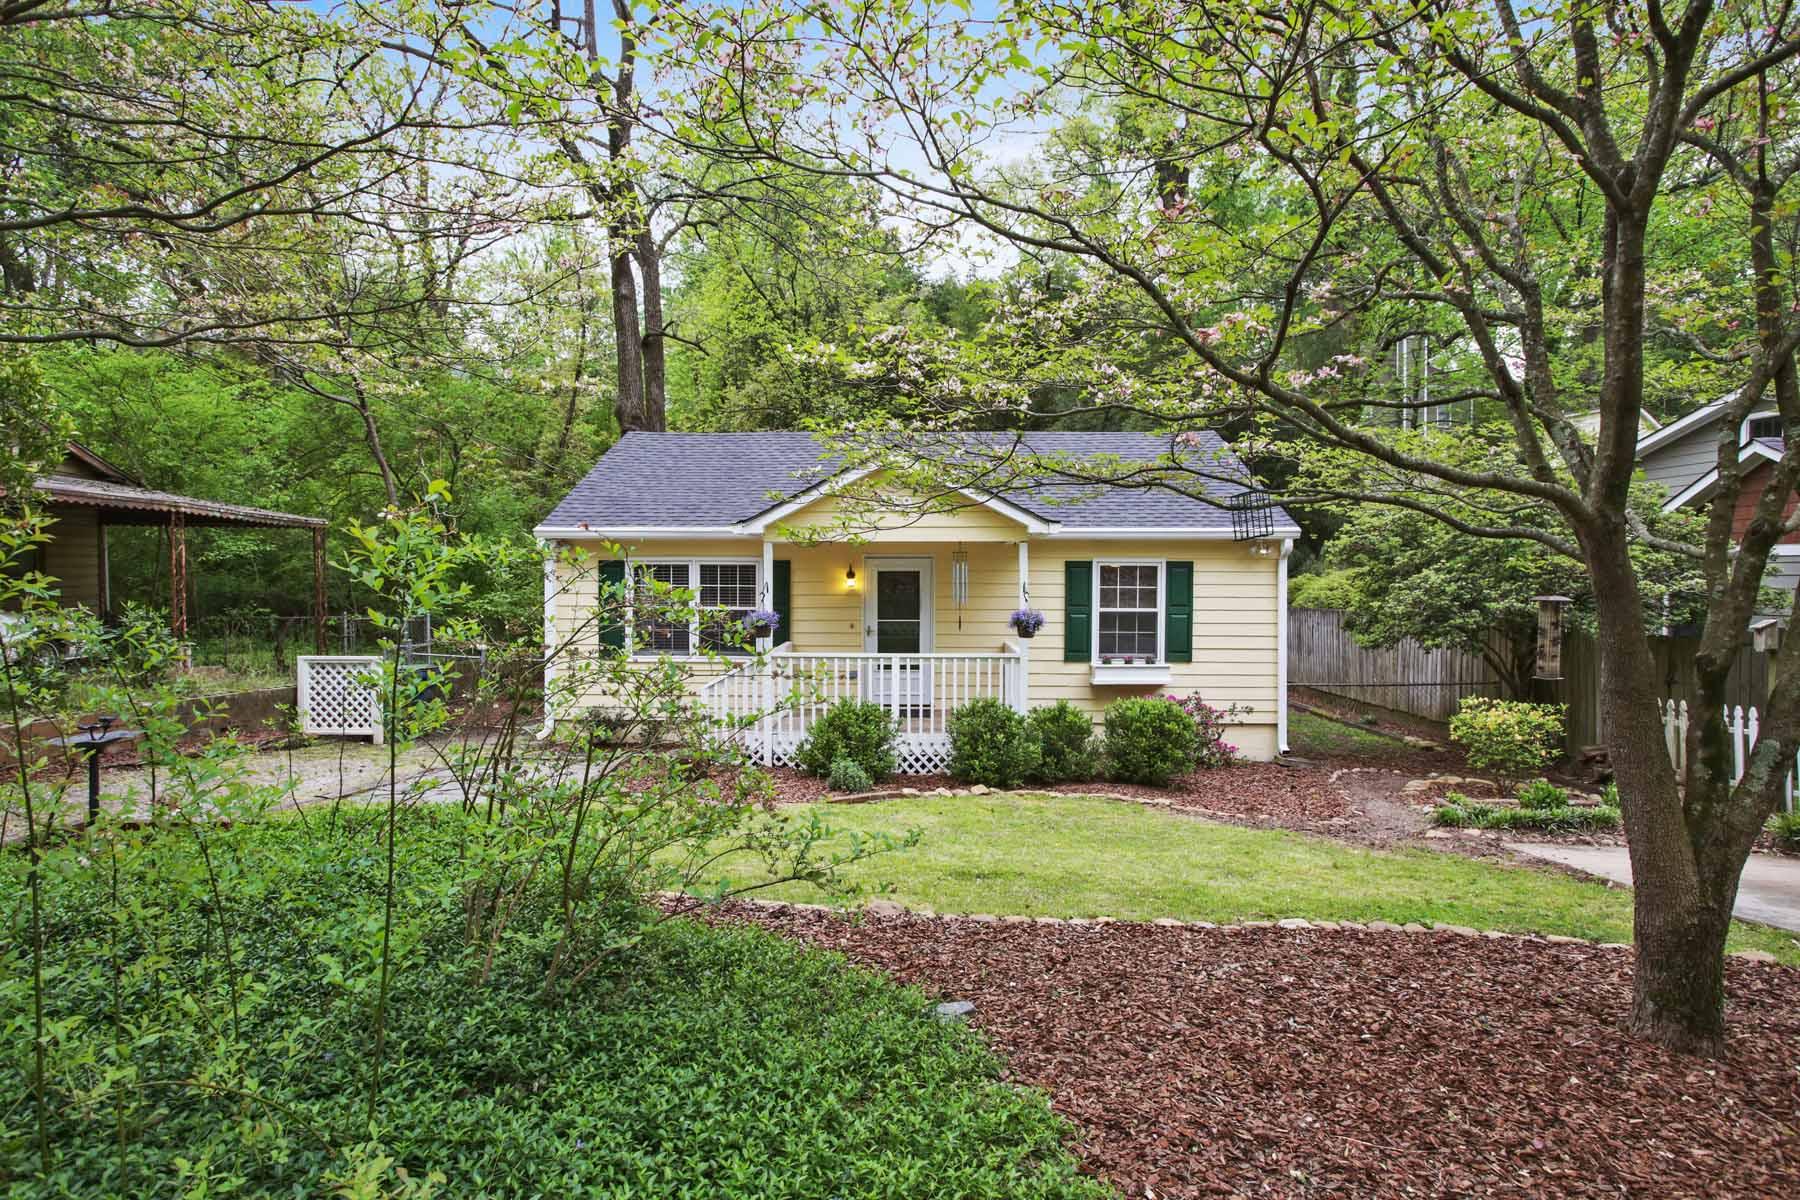 Nhà ở một gia đình vì Bán tại Amazing Value for 21 Updated Ormewood Park Bungalow! 989 Ormewood Avenue SE Atlanta, Georgia 30316 Hoa Kỳ